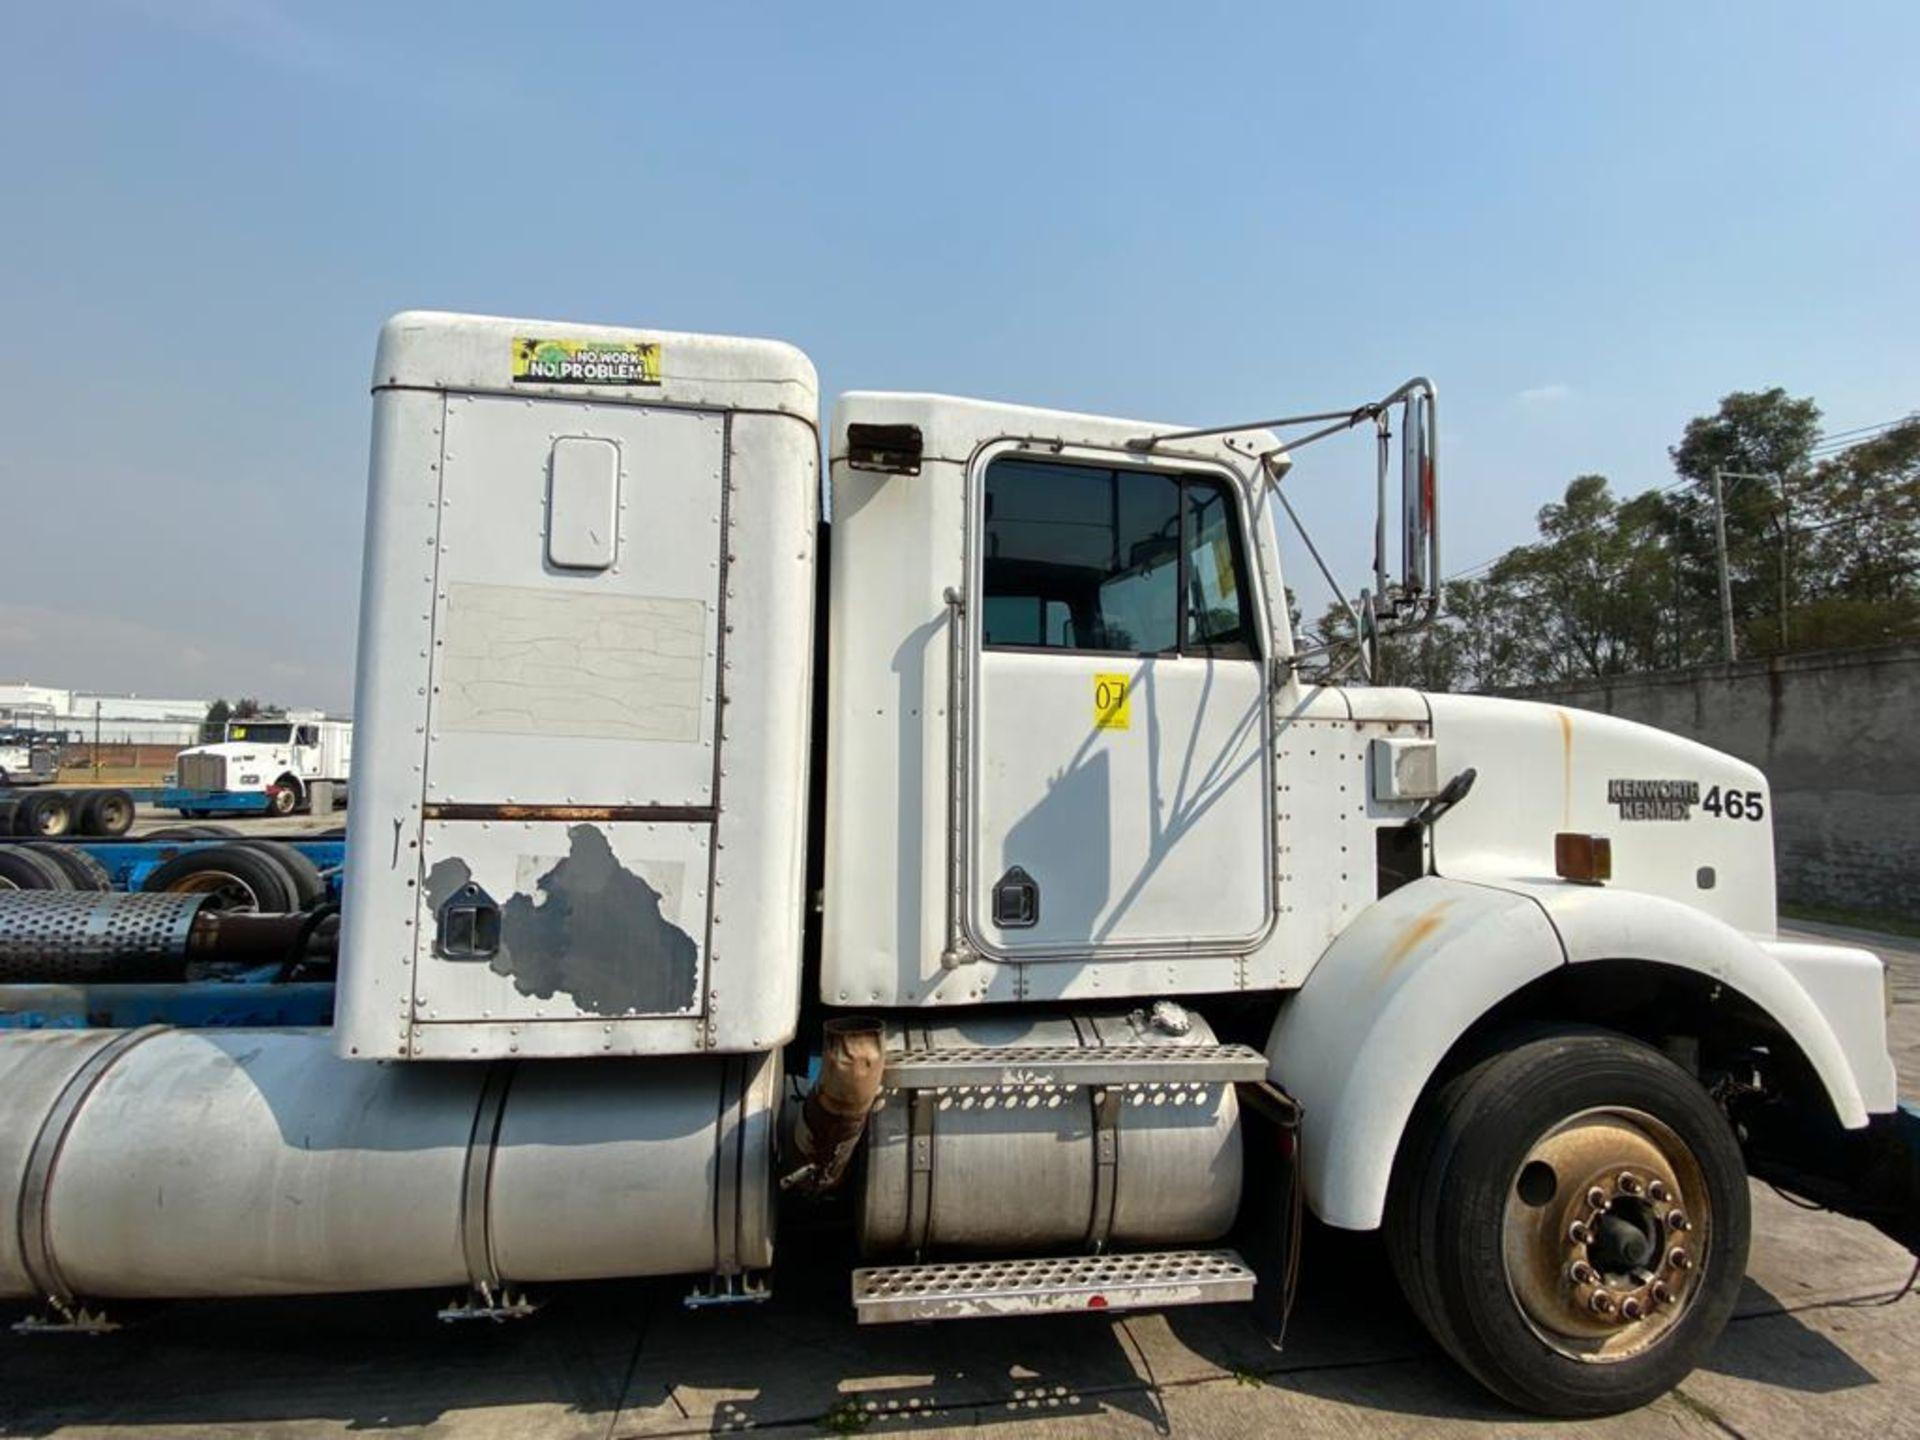 1999 Kenworth Sleeper truck tractor, standard transmission of 18 speeds - Image 52 of 72